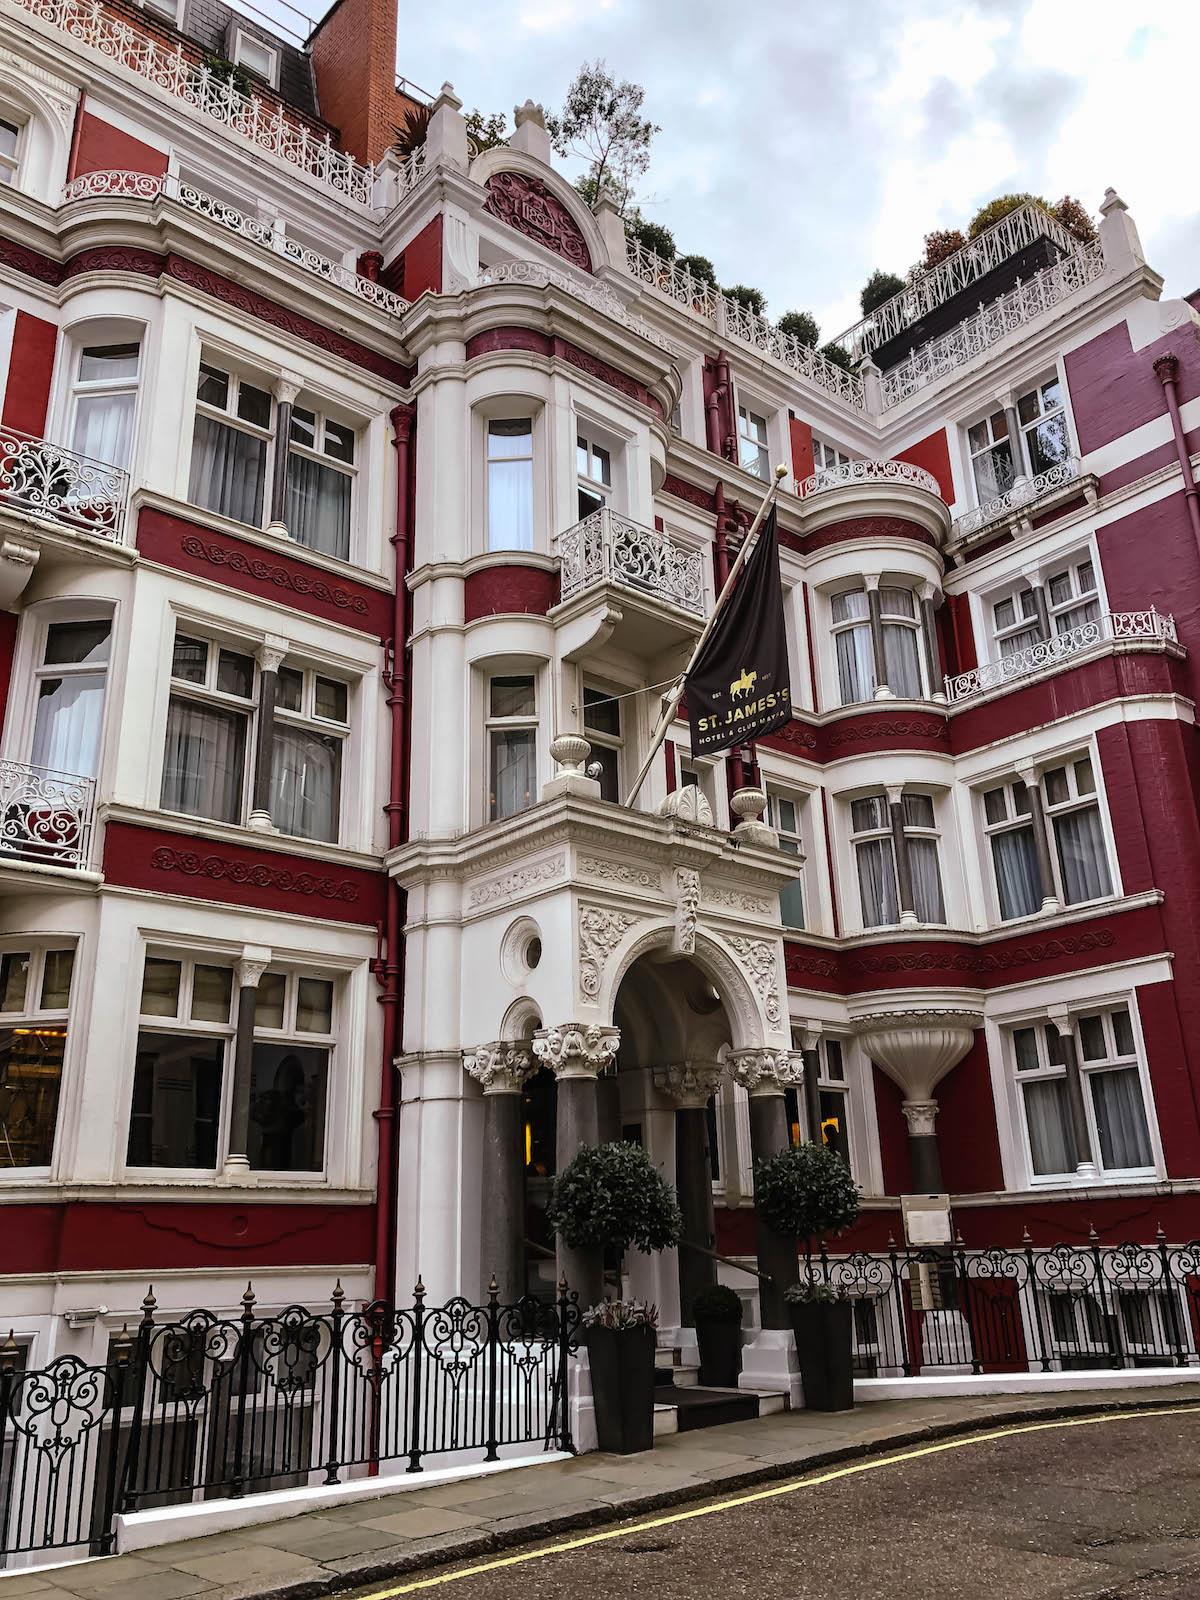 St. James Hotel London